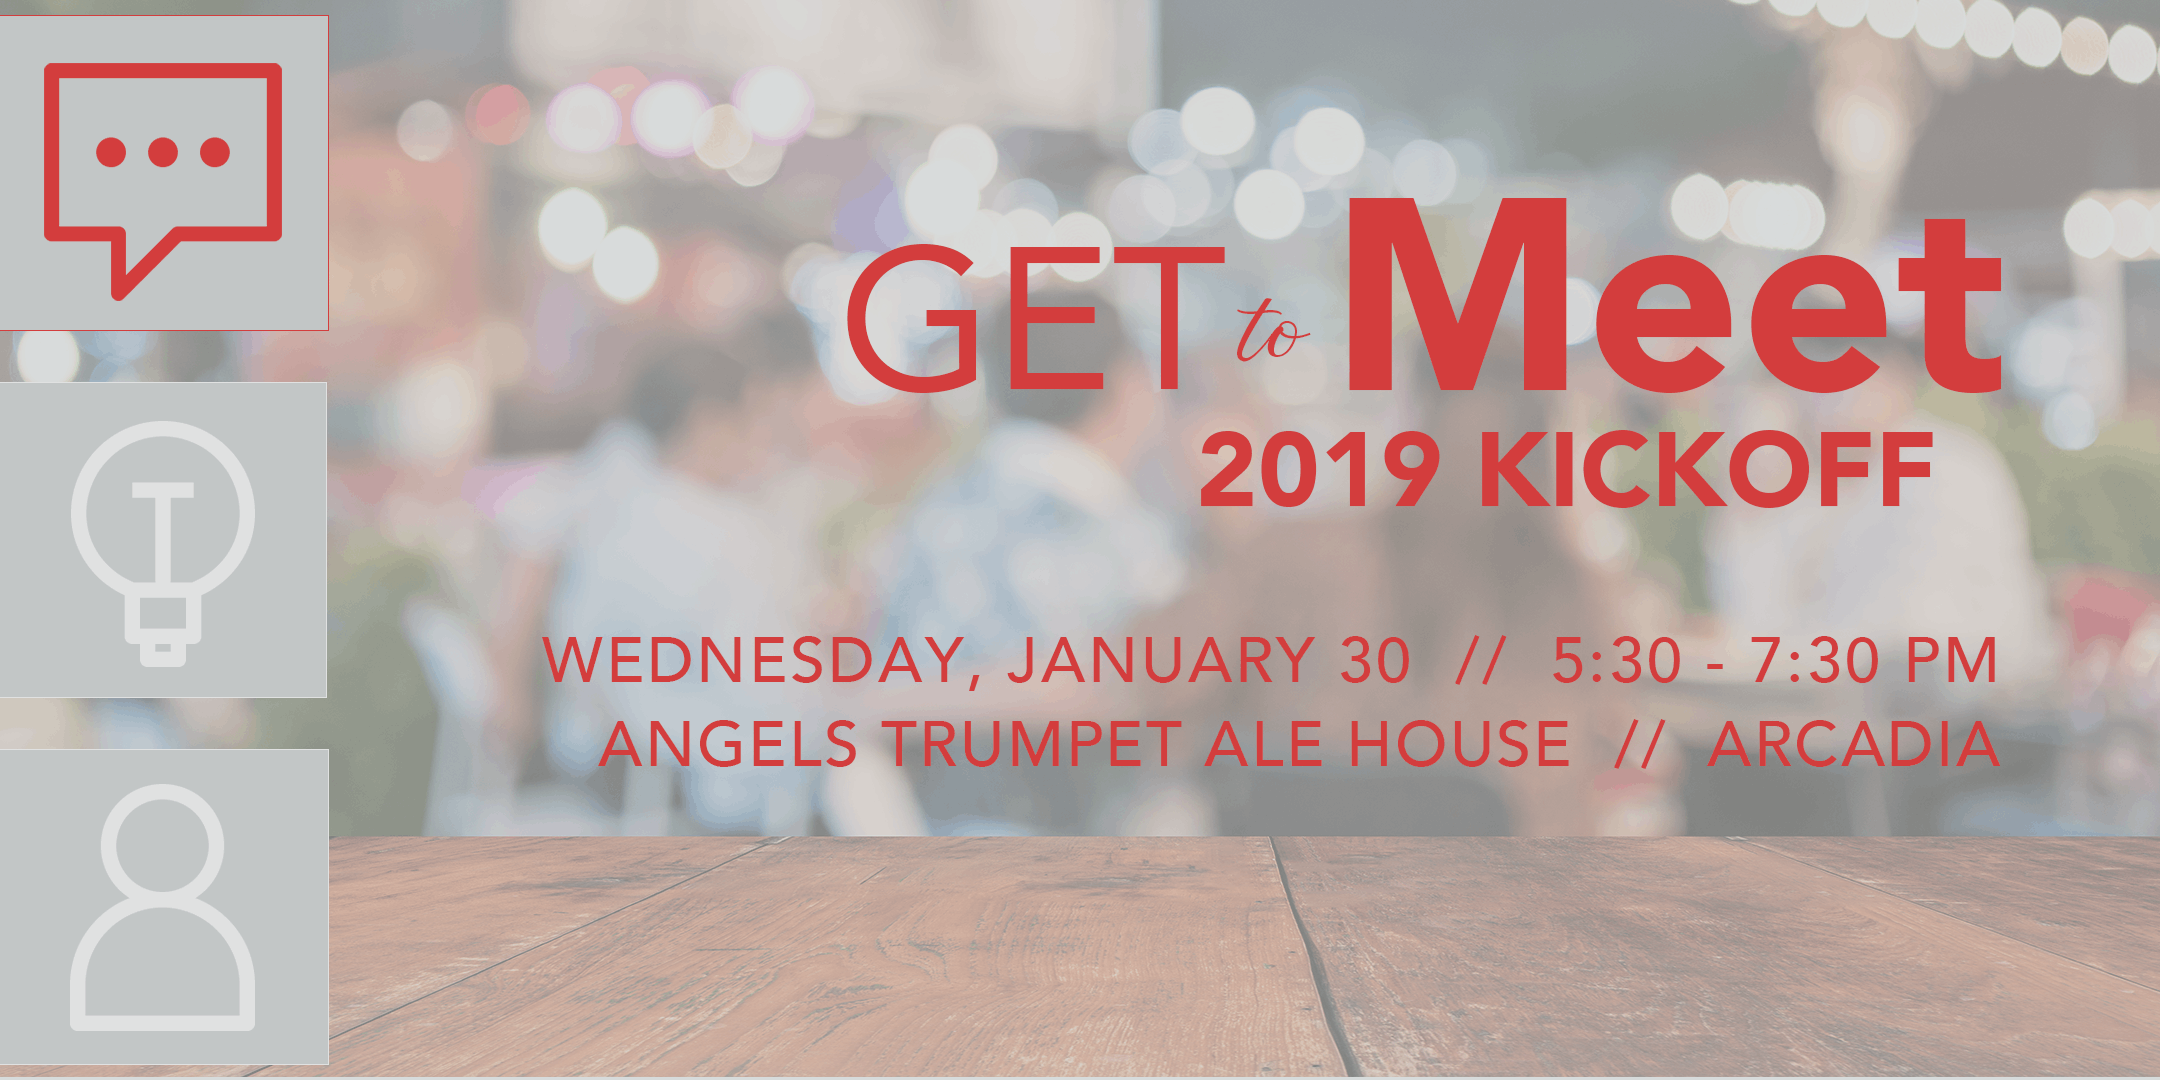 GET to Meet: 2019 Kickoff!